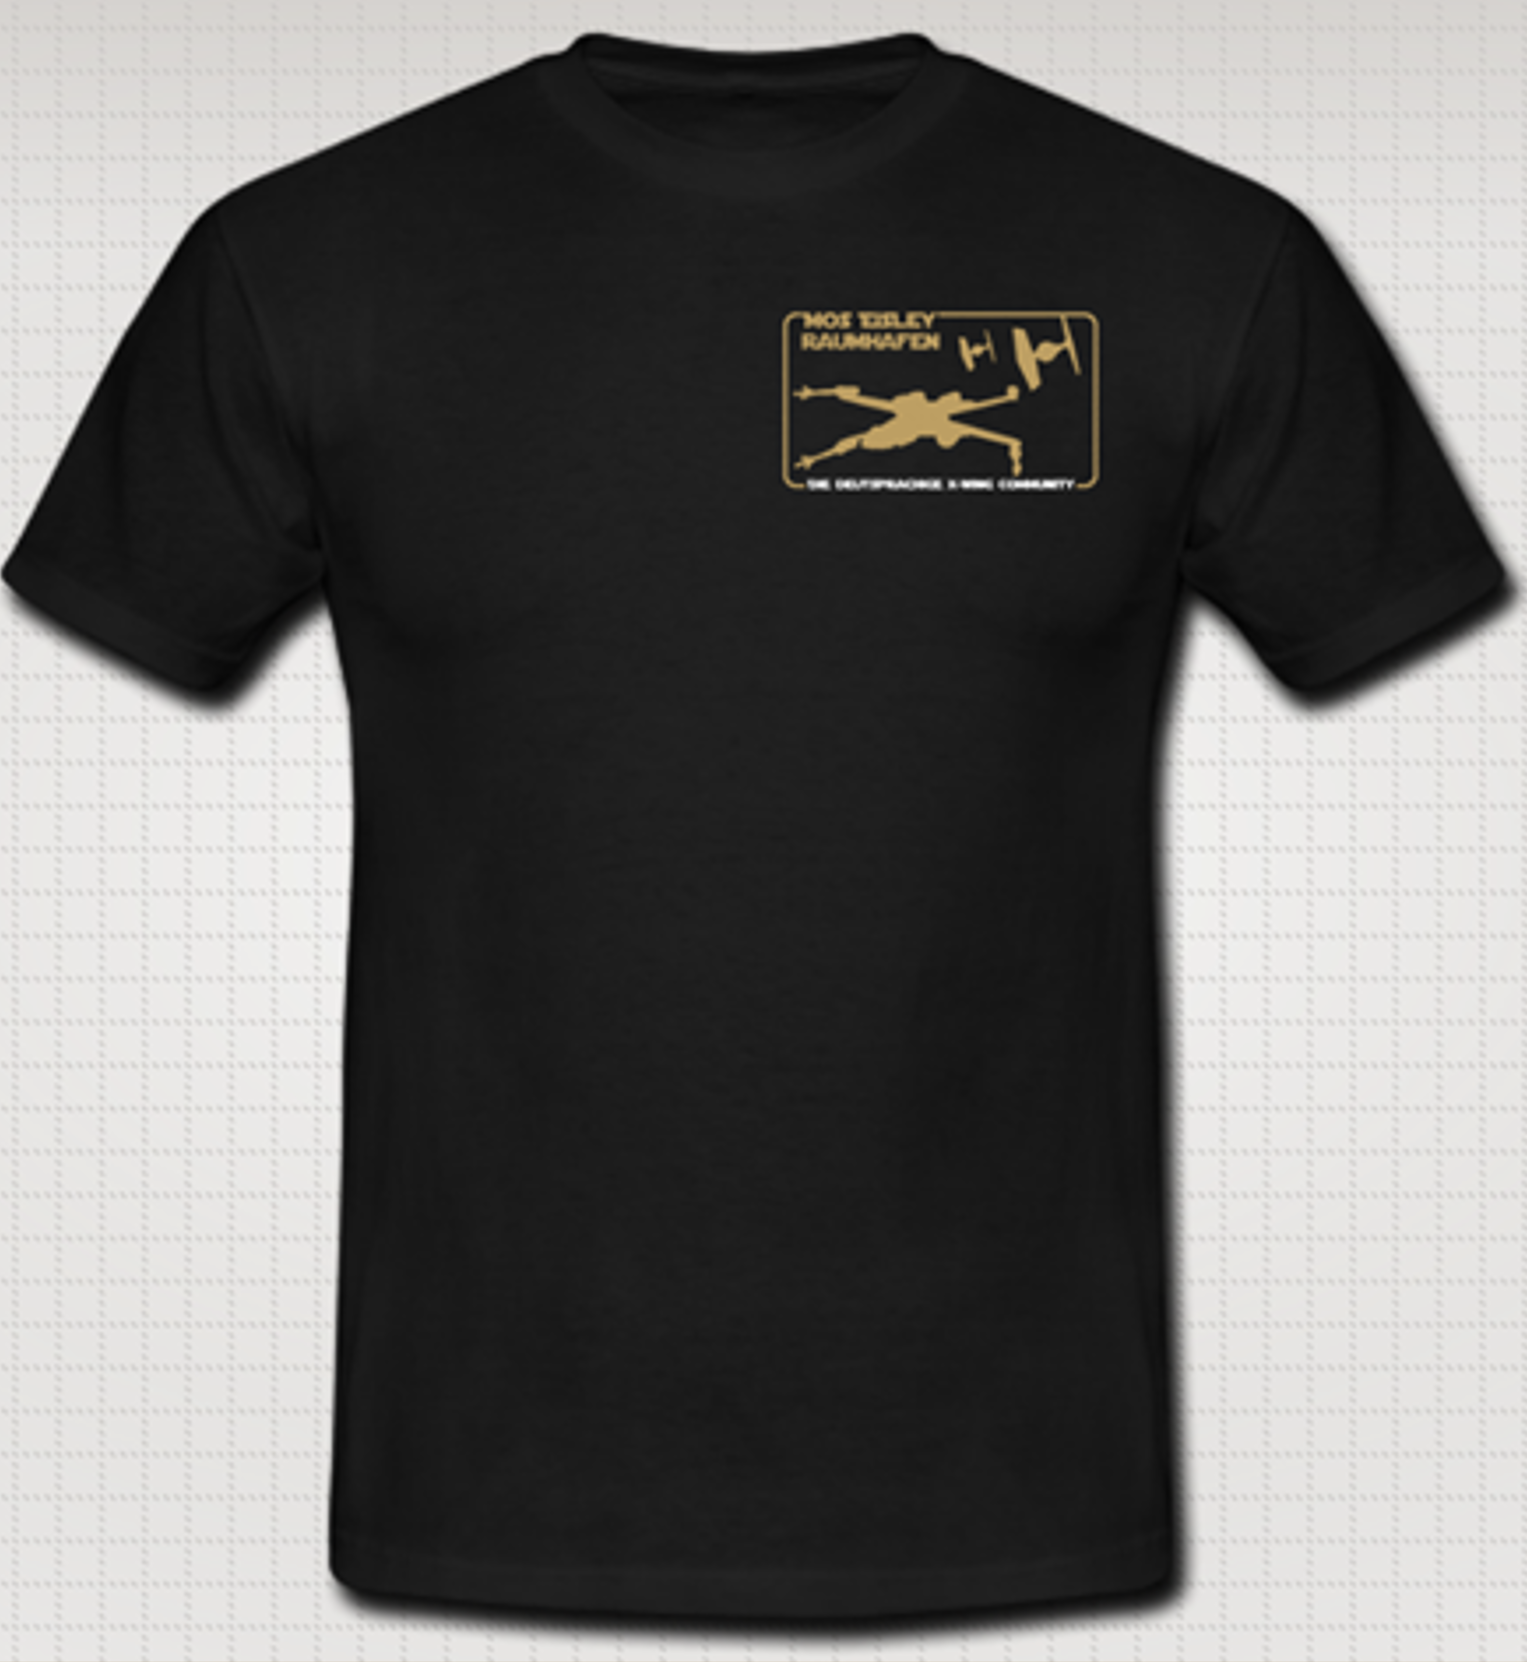 Shirtwettbewerb zur WM - Seite 3 L7hj-2-c81e